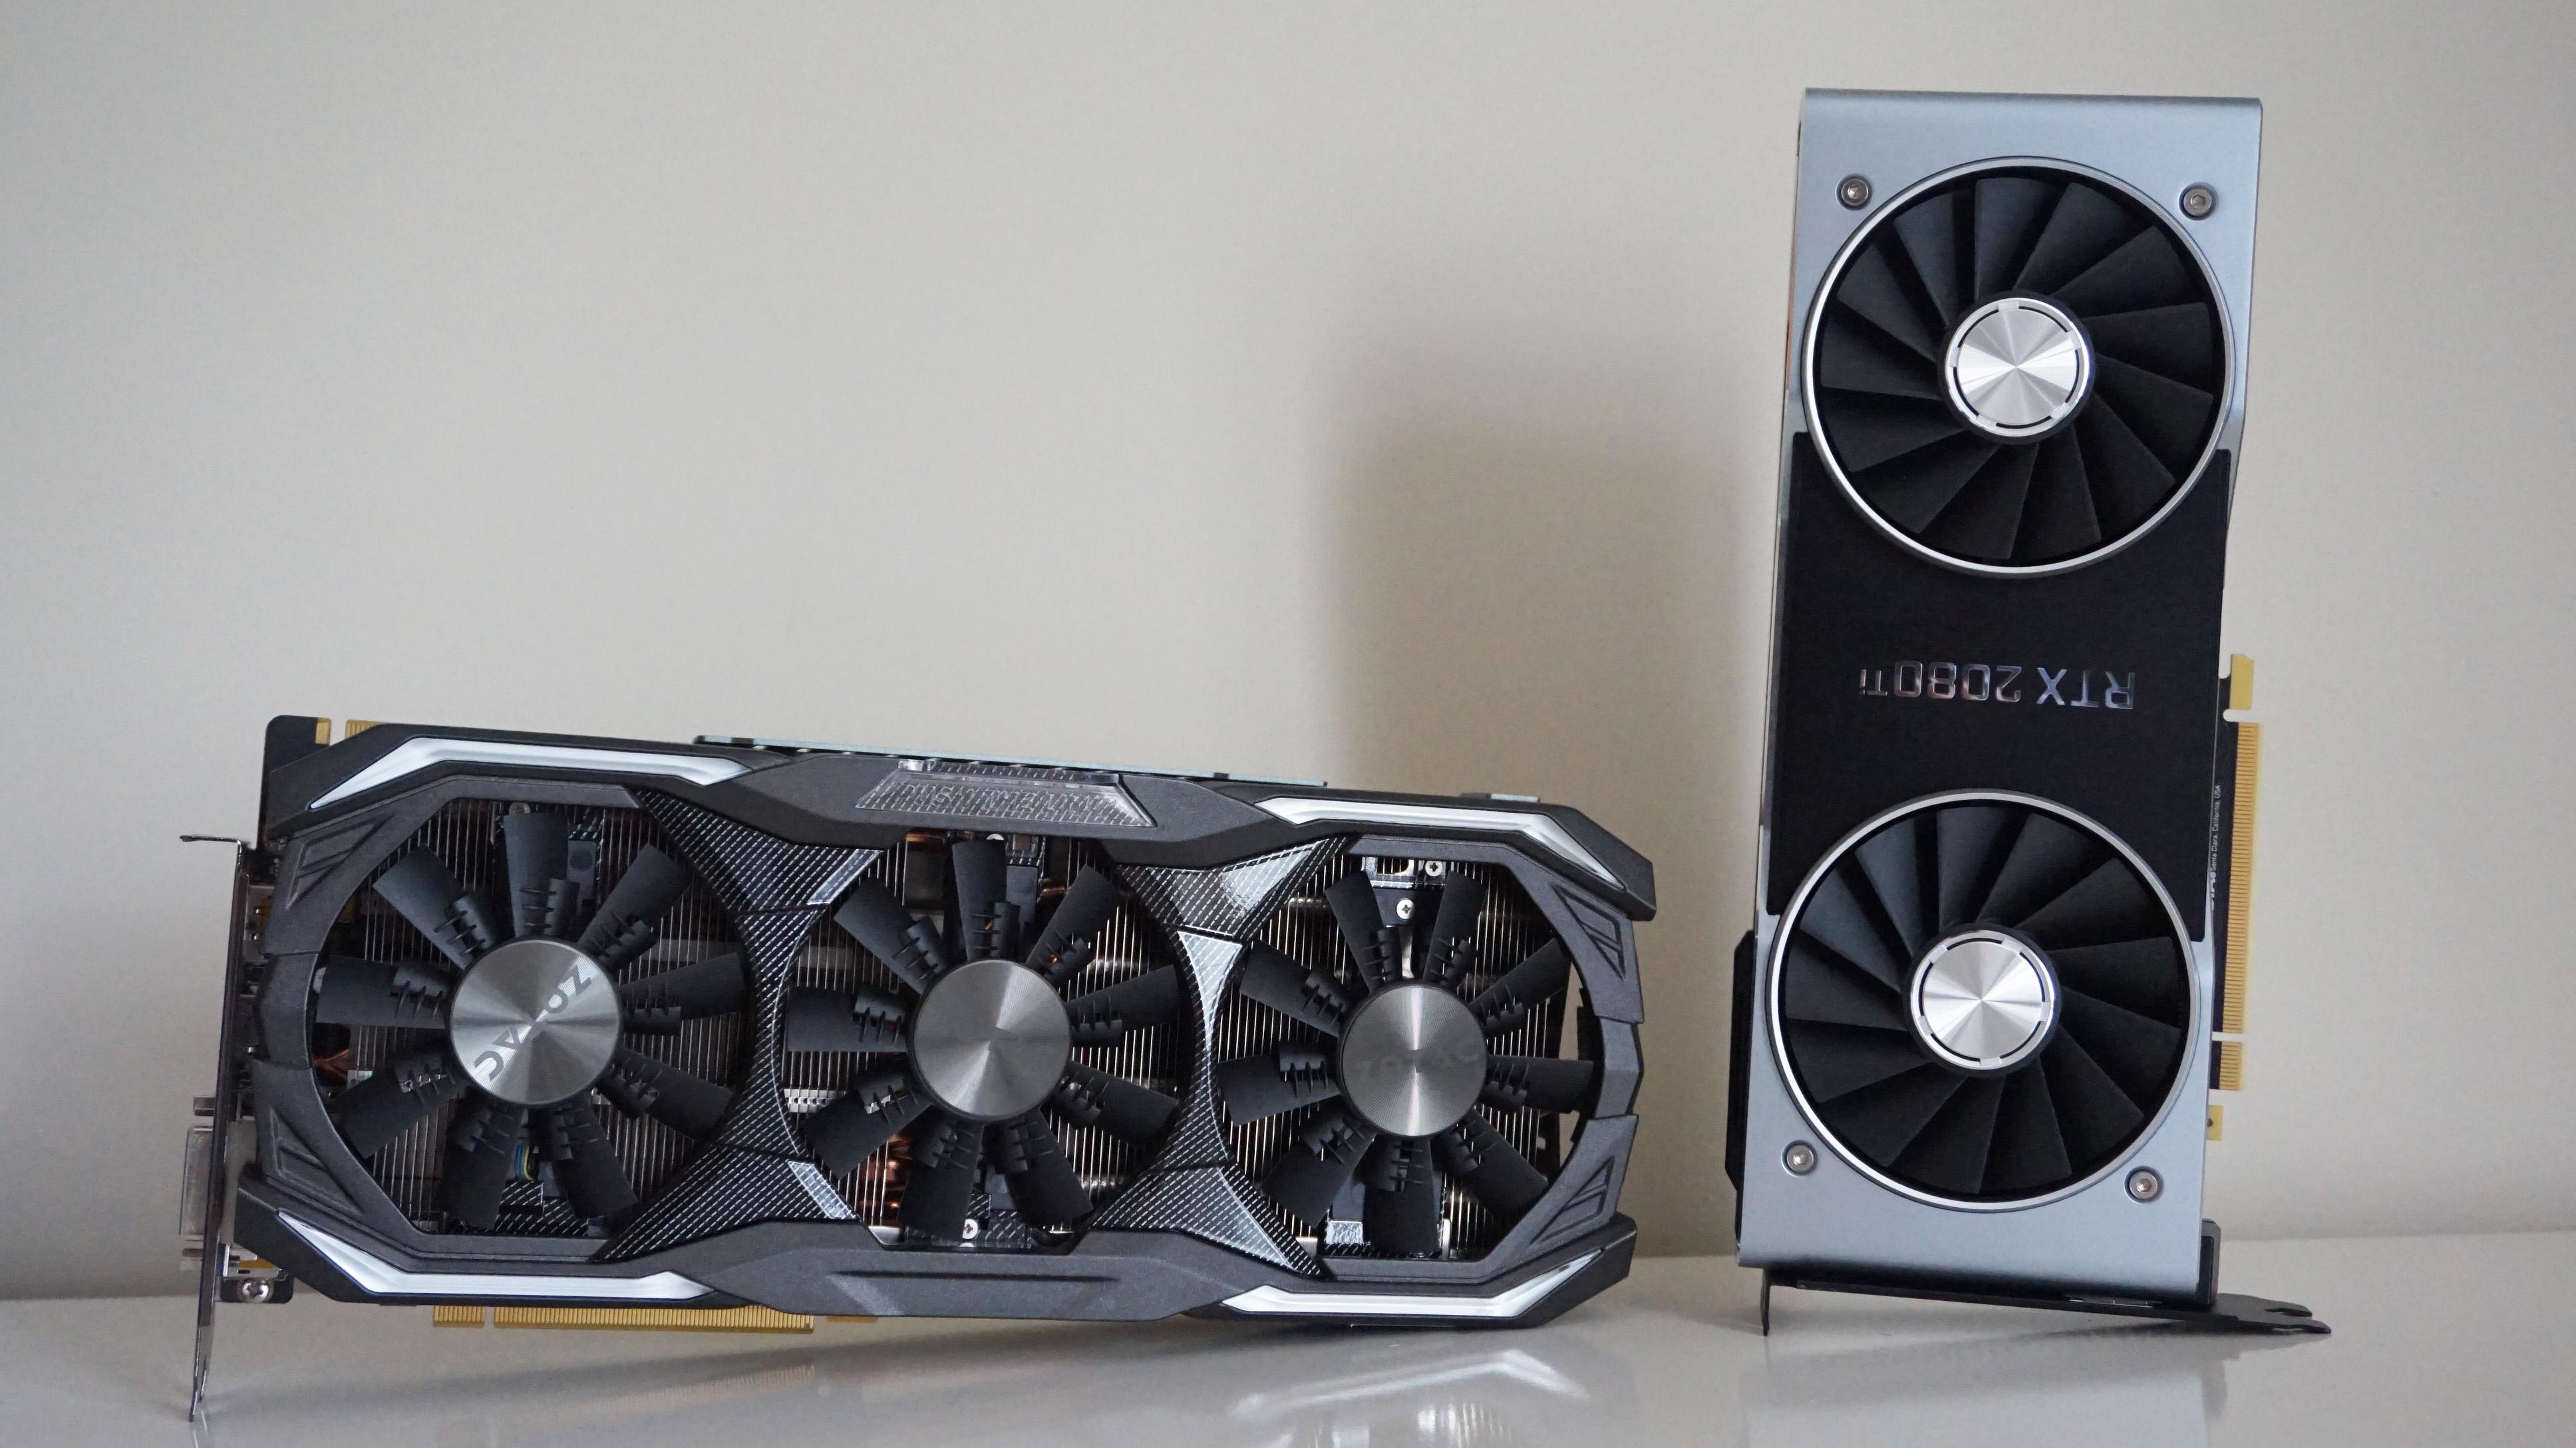 Zotac's GTX 1080 and Nvidia's RTX 2080Ti